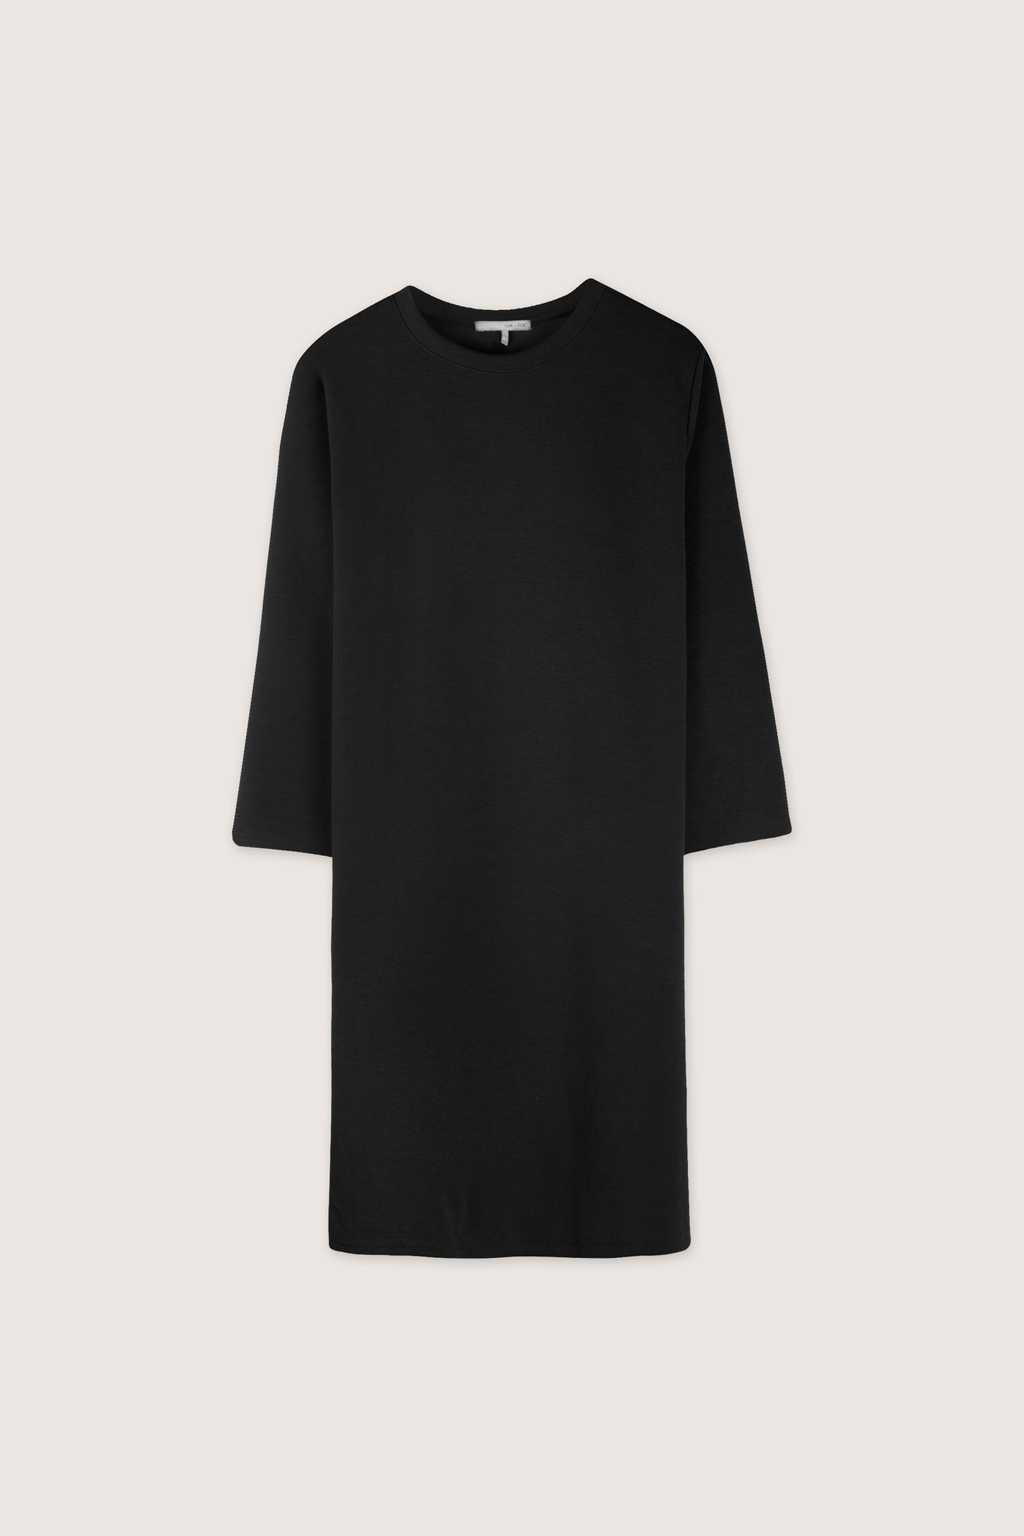 Dress H274 Black 7